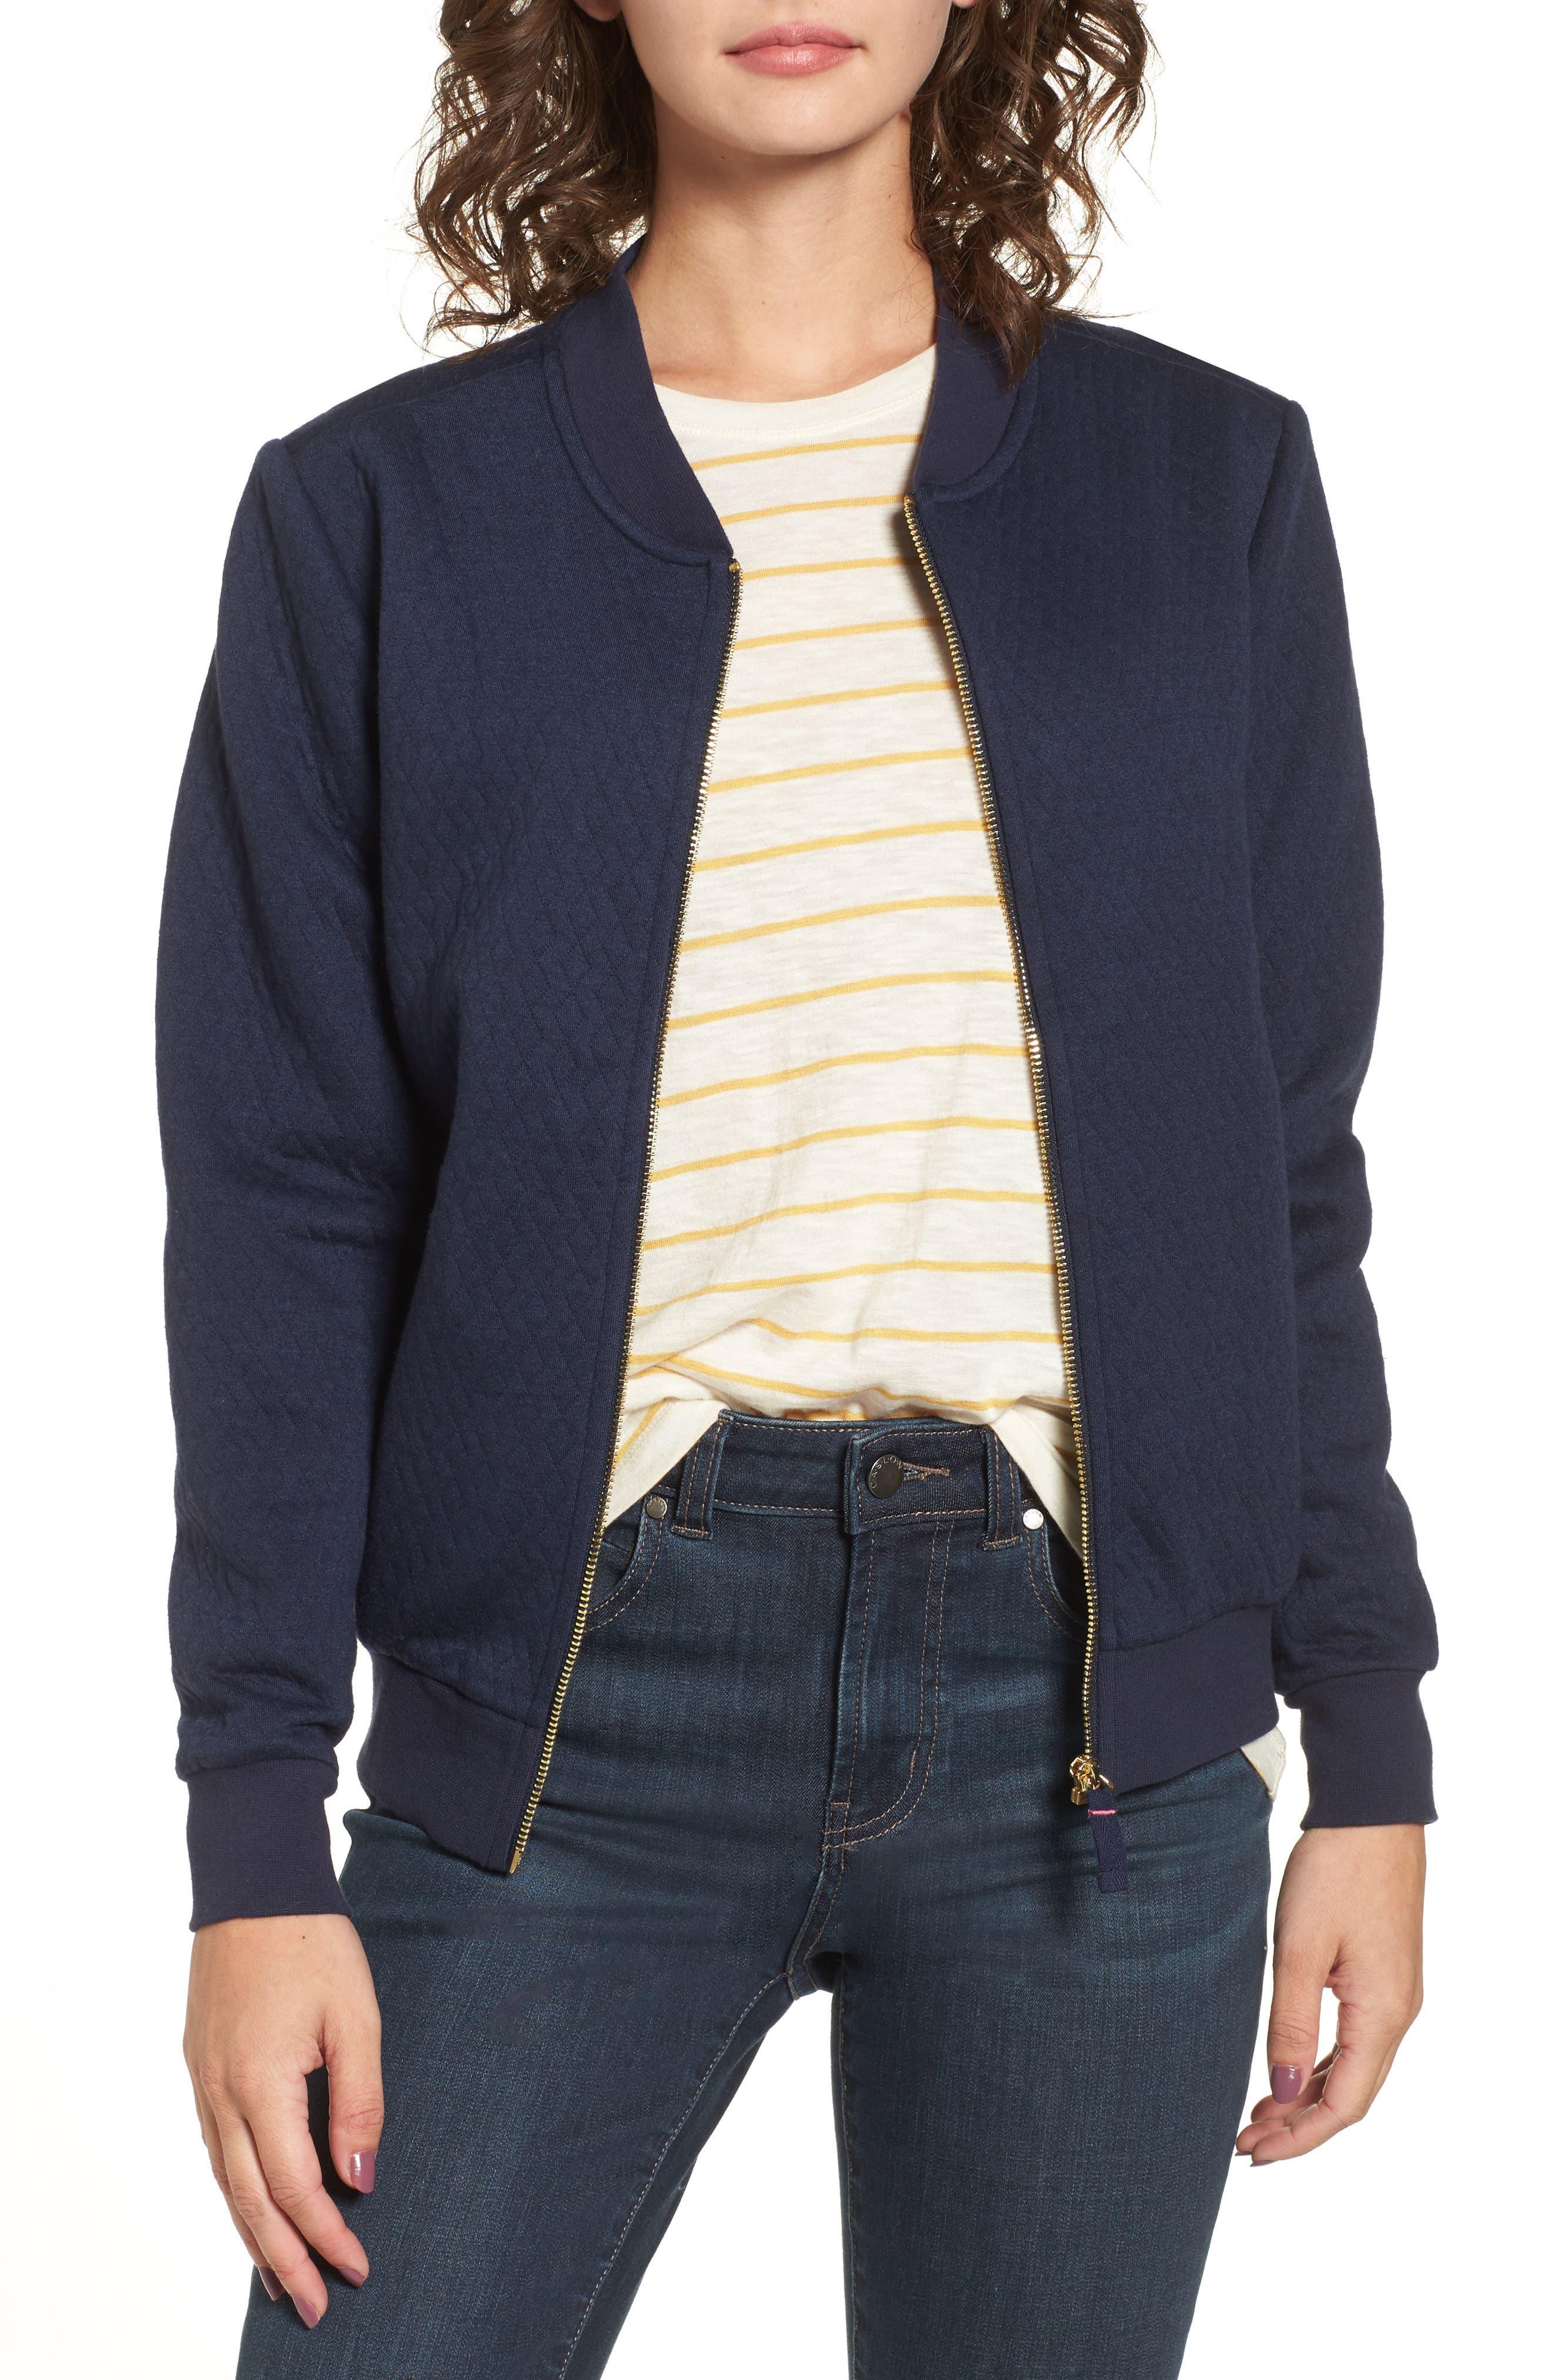 Main Image - Joules Millie Bomber Sweatshirt Jacket